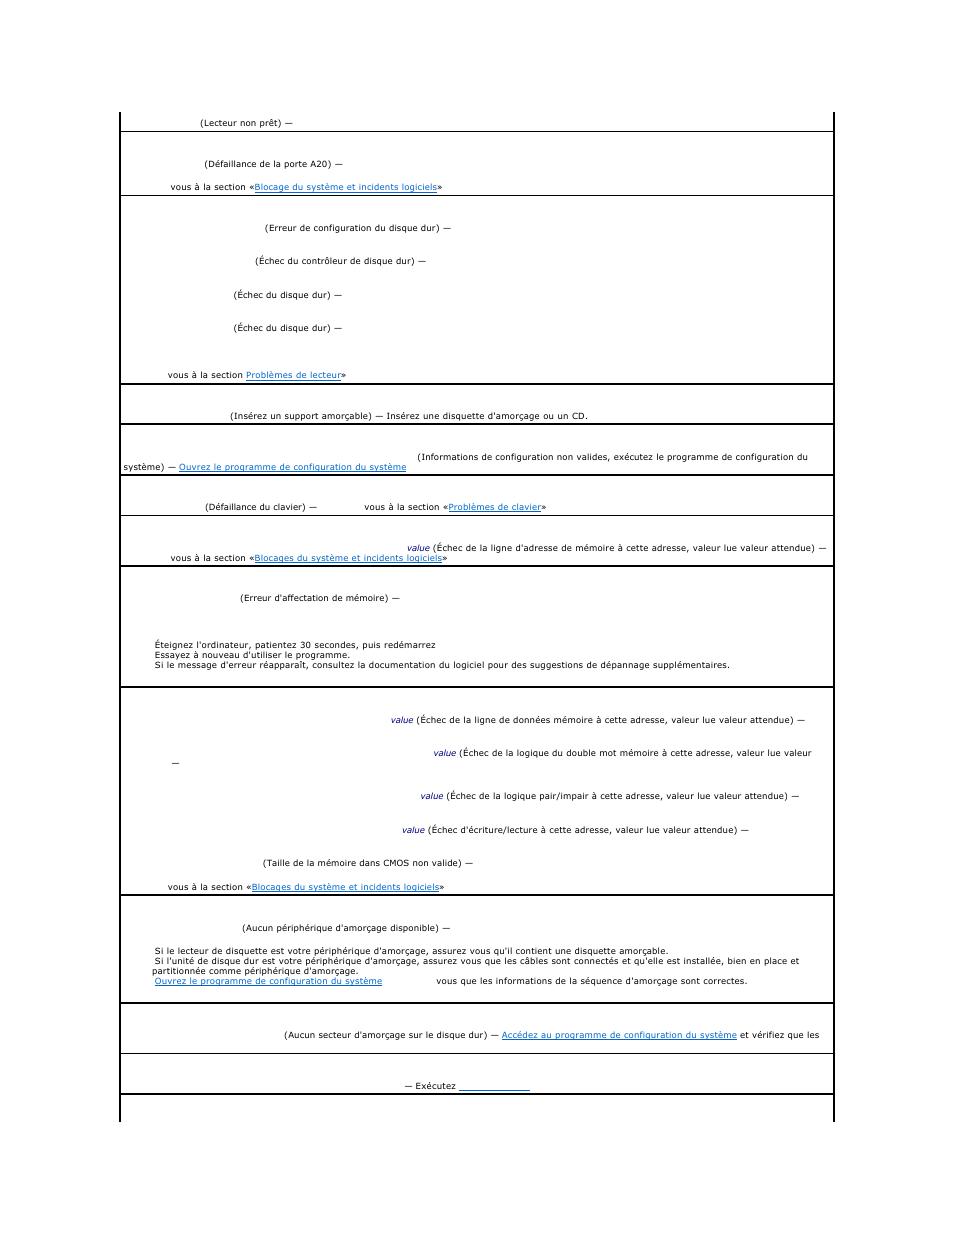 Dell OptiPlex GX620 Manuel d'utilisation   Page 221 / 262